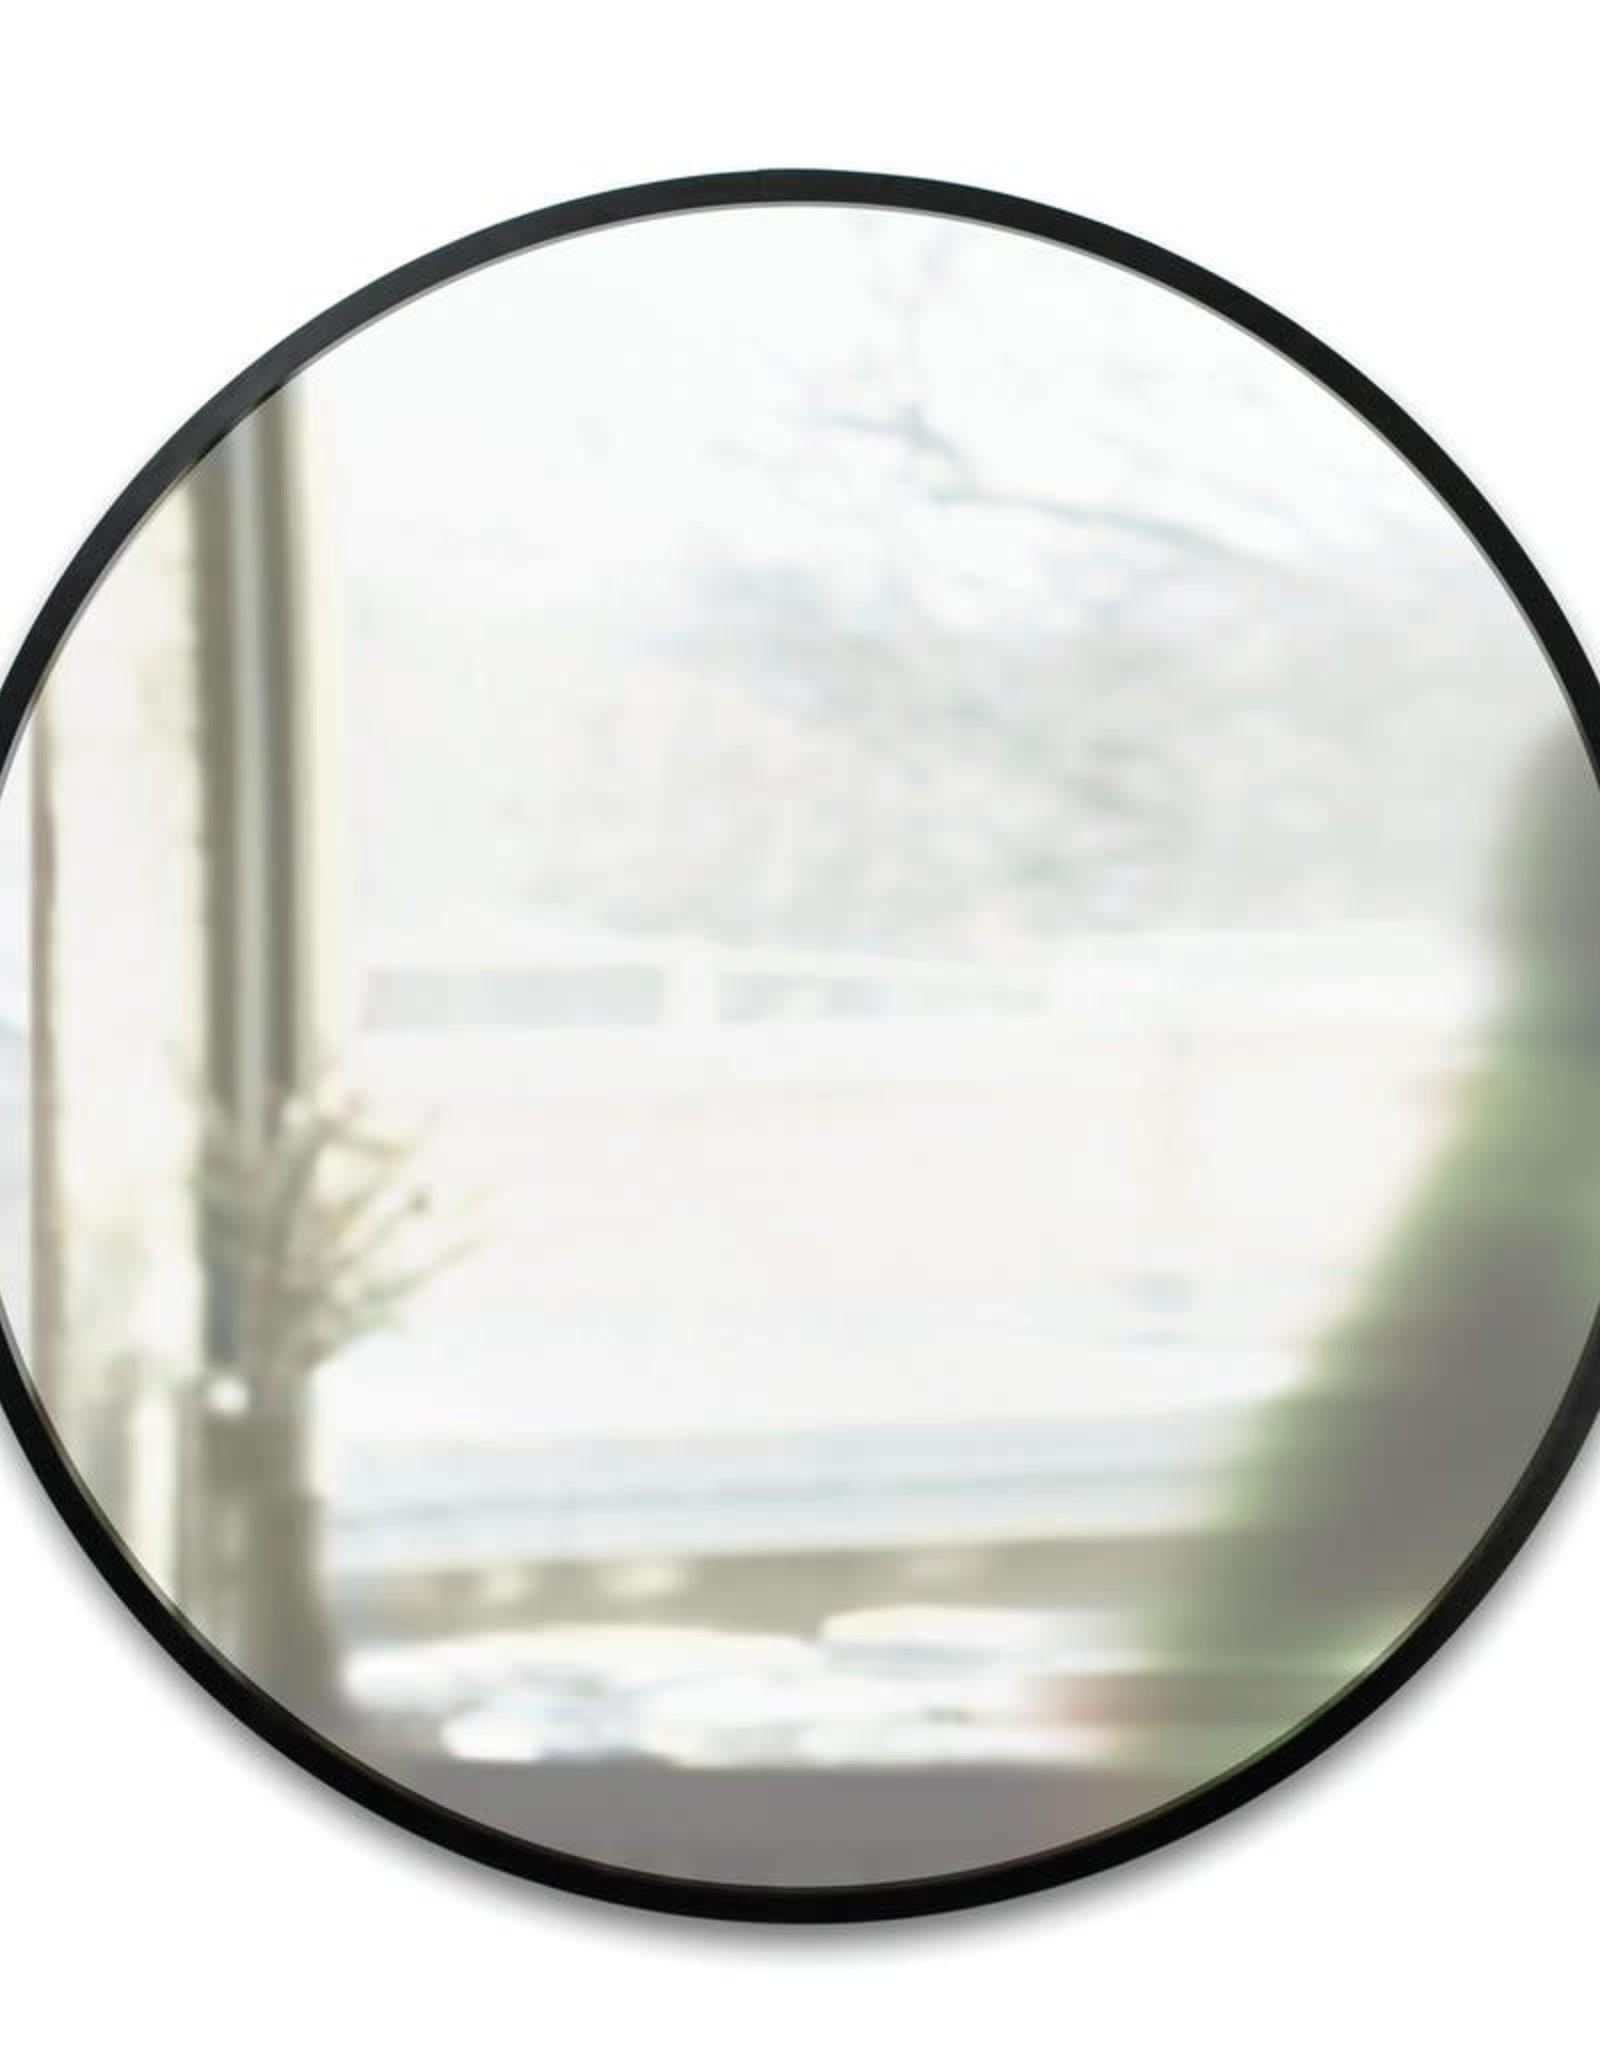 Umbra Umbra - Hub wall mirror - black - small